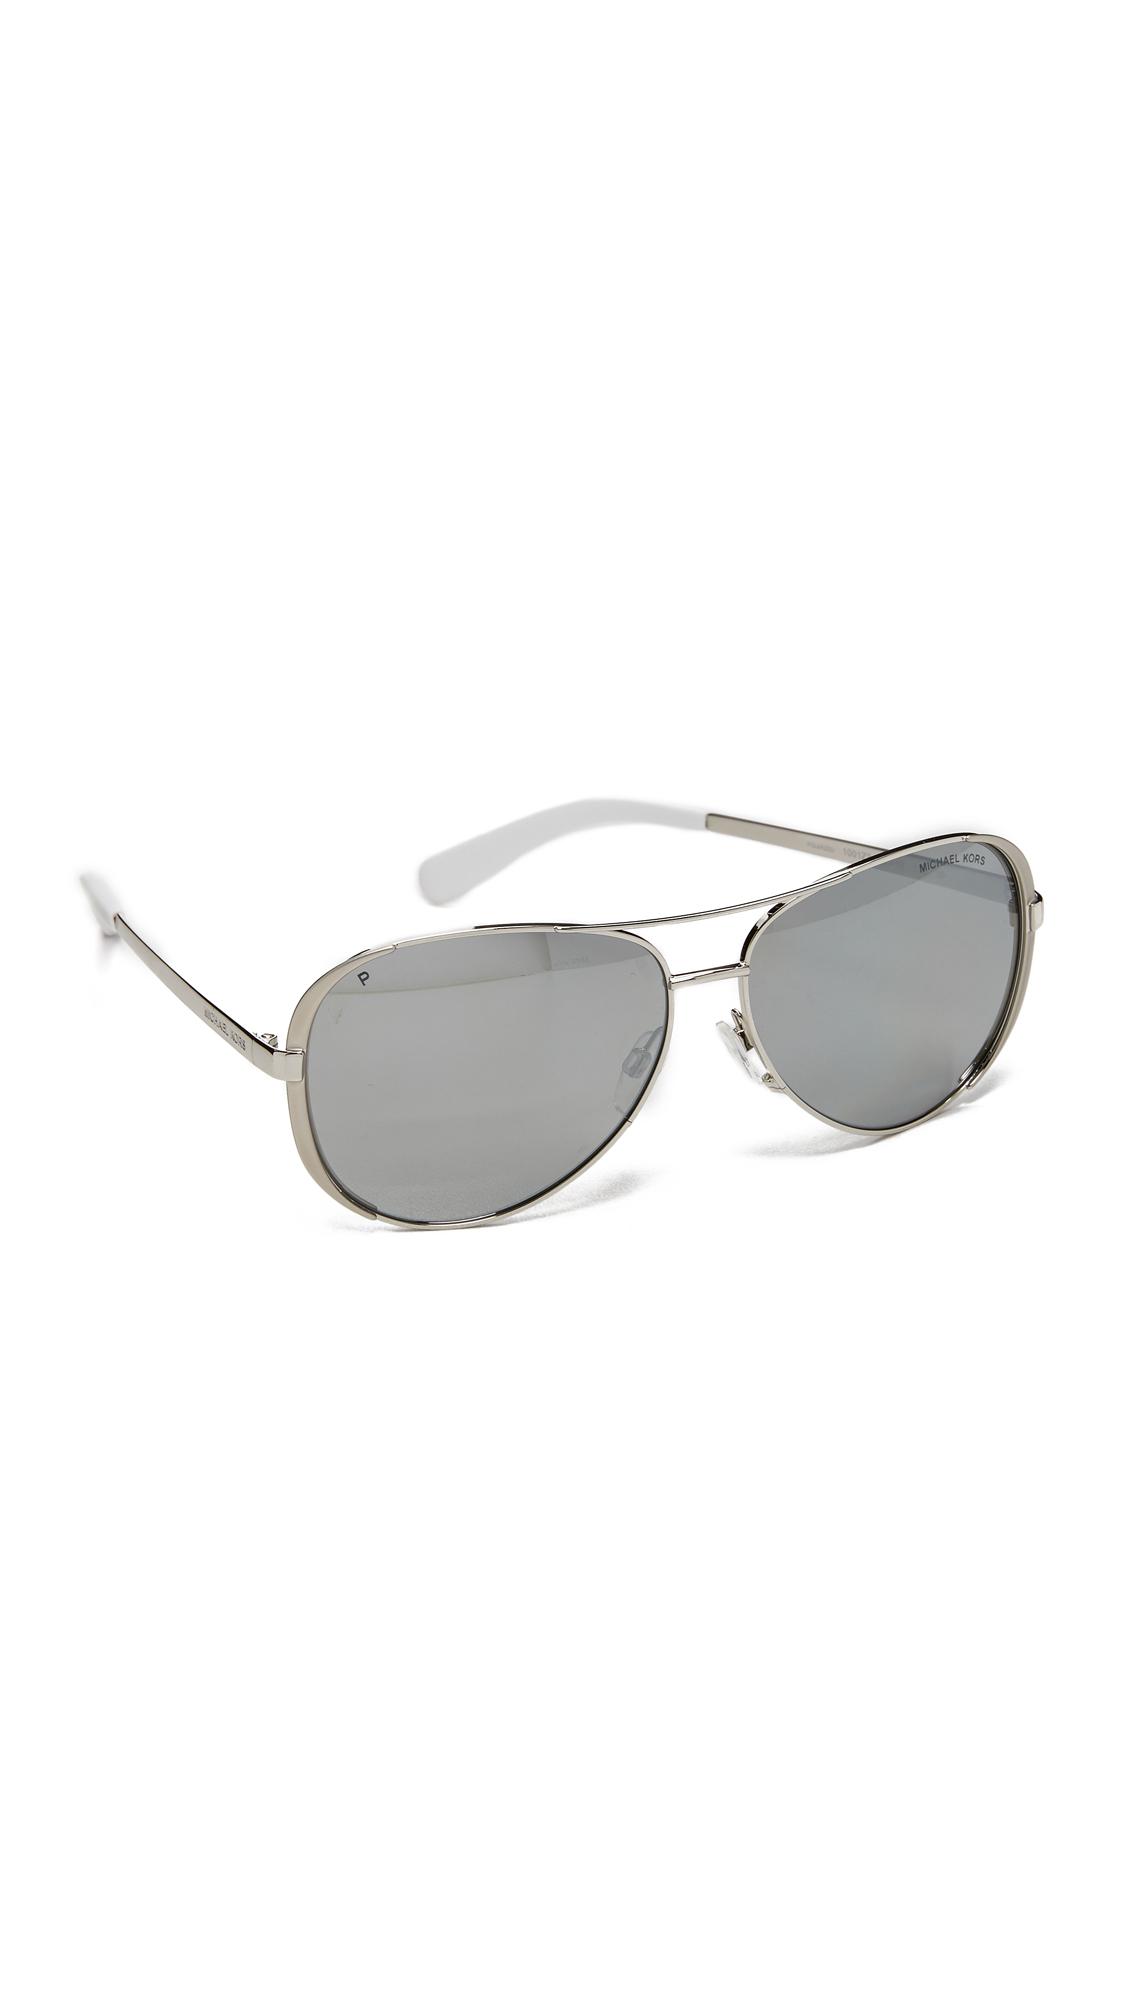 4b5b9b09b700 ... clearance lyst michael kors chelsea polarized sunglasses in metallic  259cb d0a79